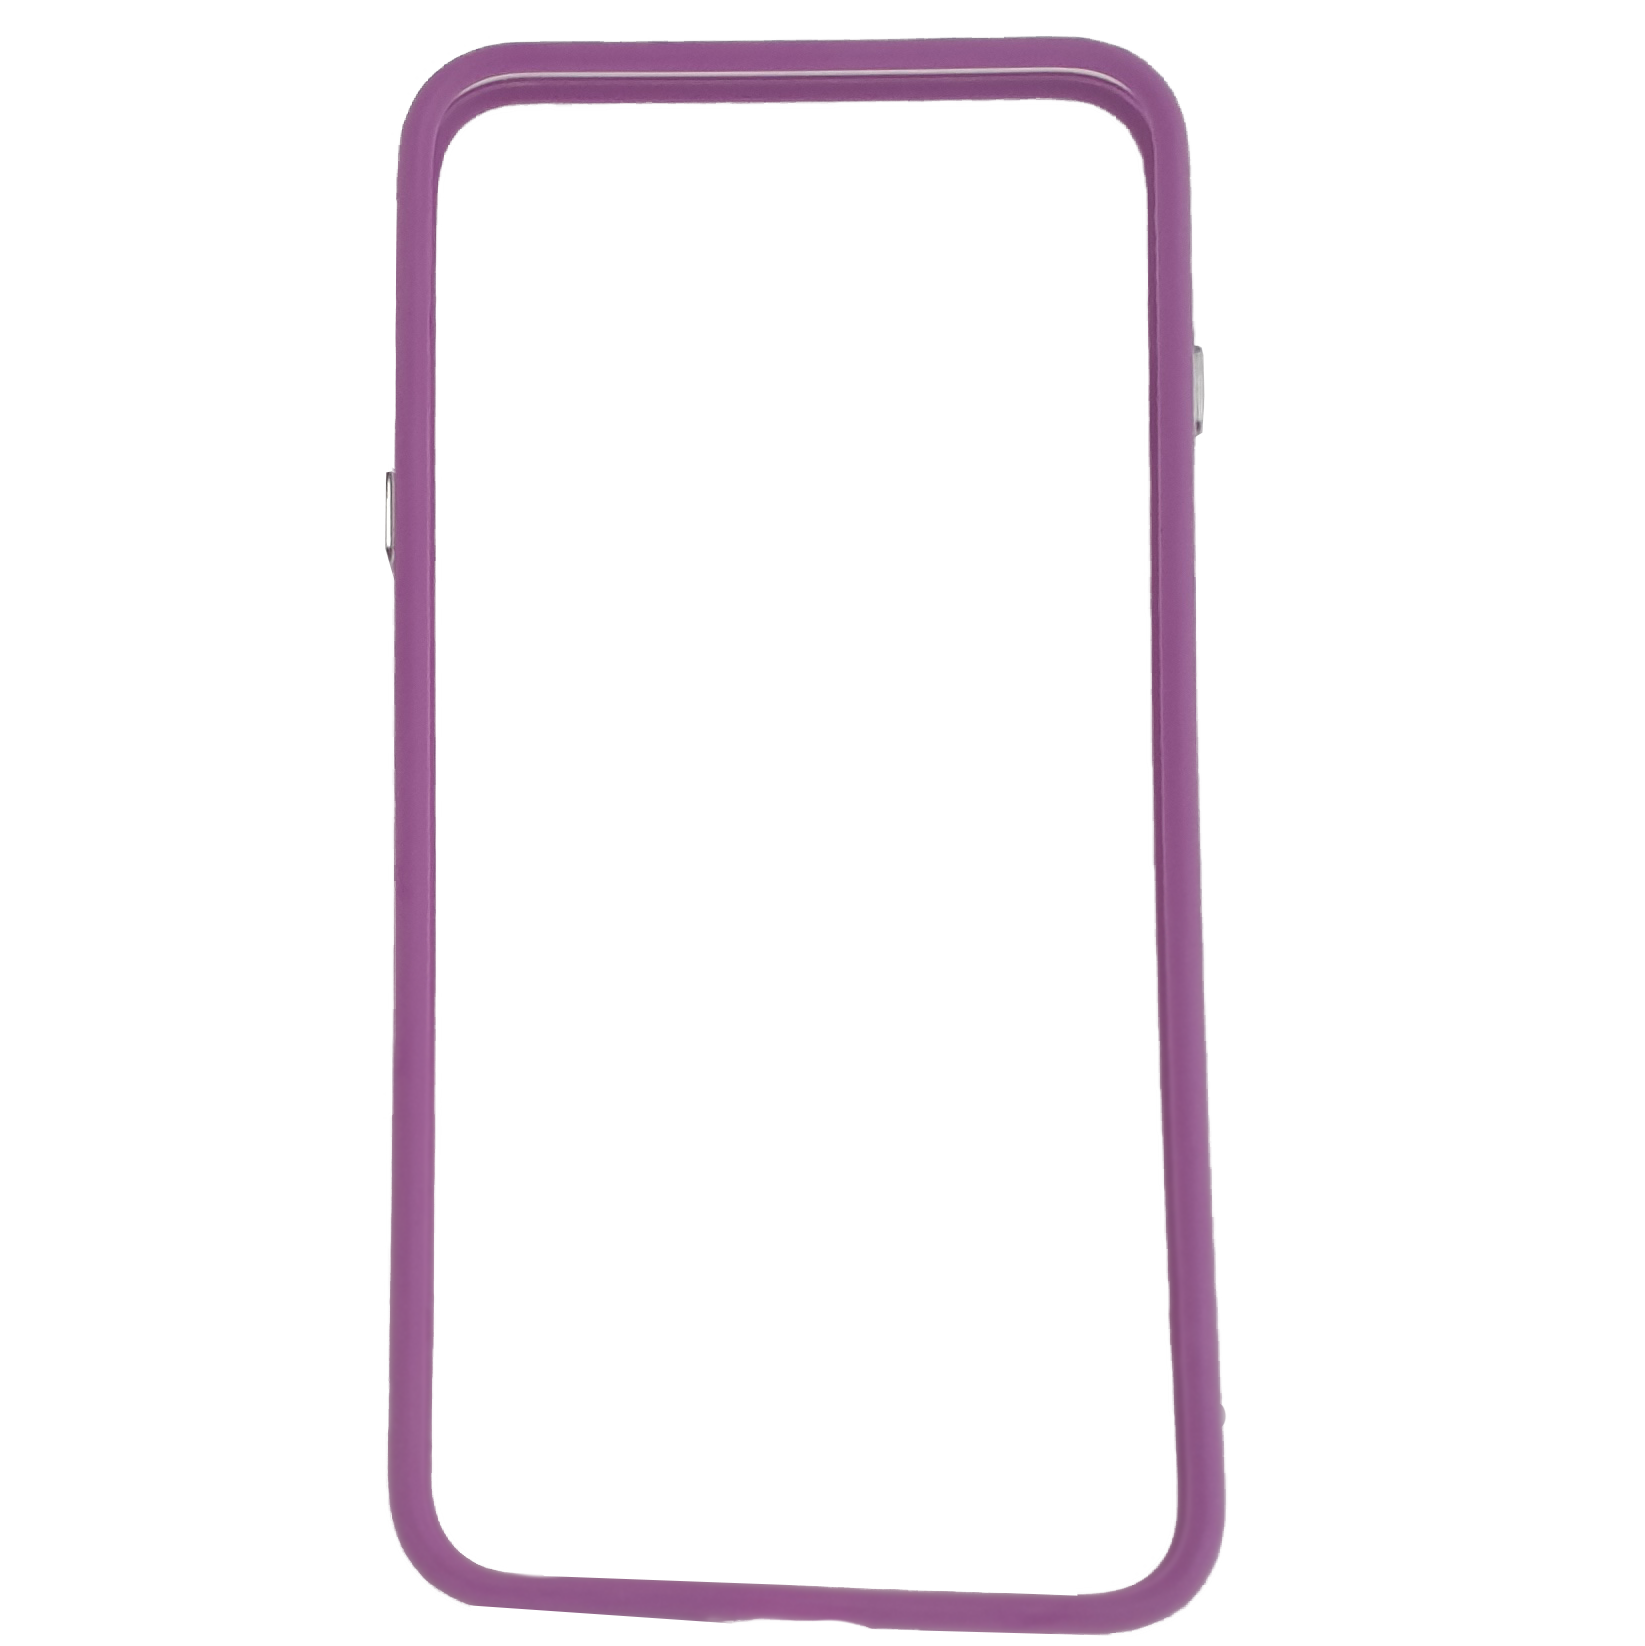 Mobilskal Bumper iPhone 6+/7+/8+ Lila